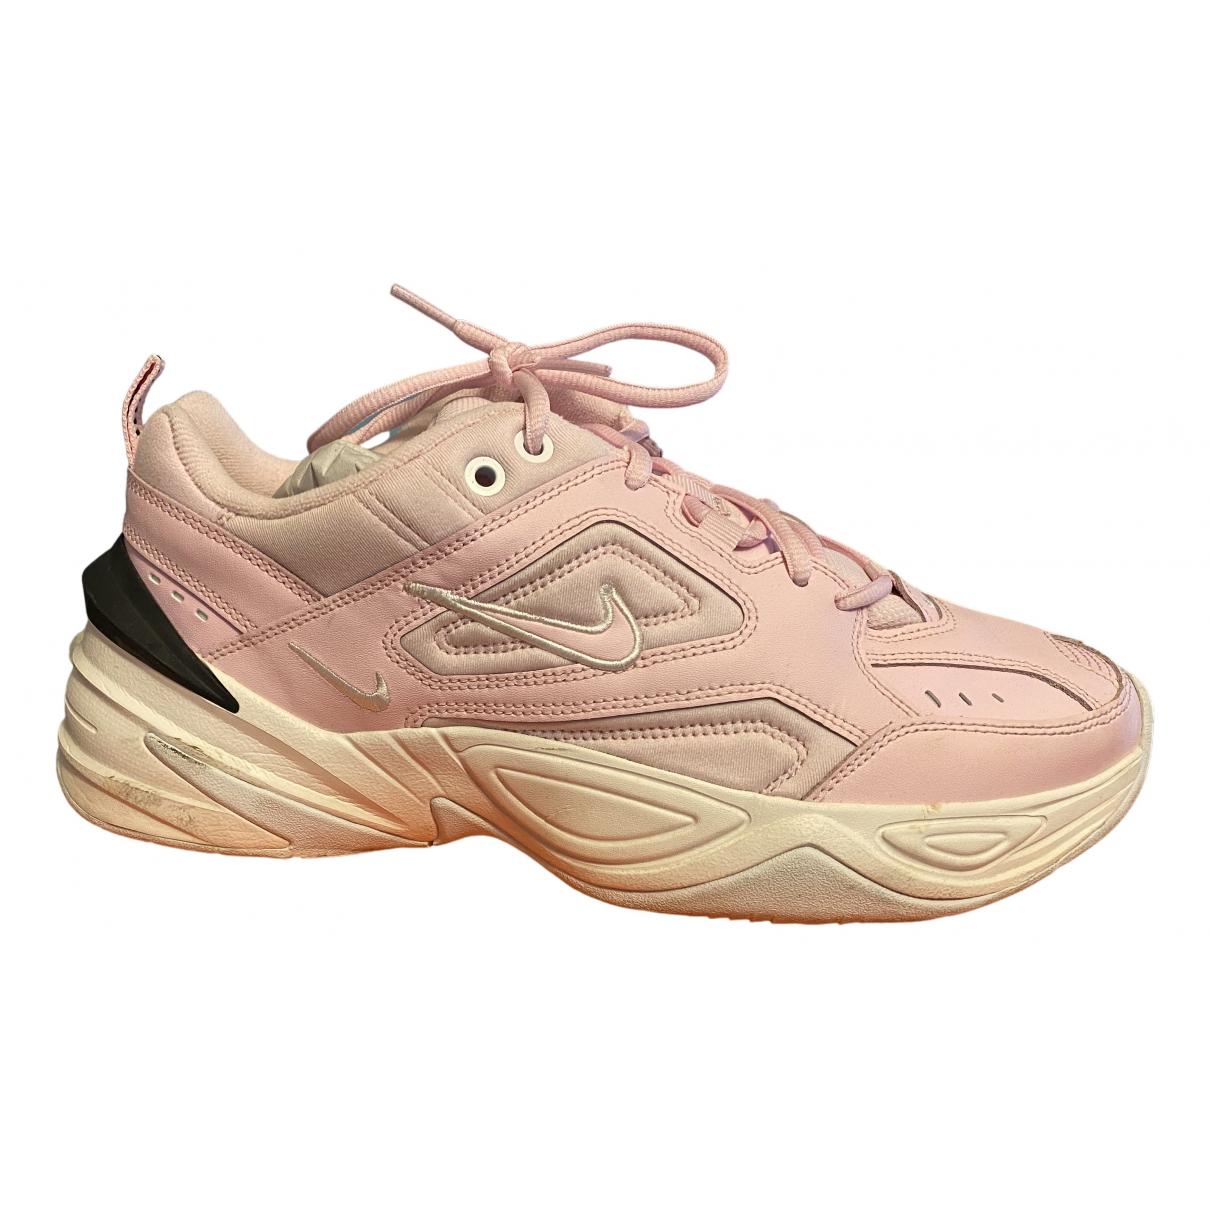 Nike - Baskets M2K Tekno pour femme en cuir - rose